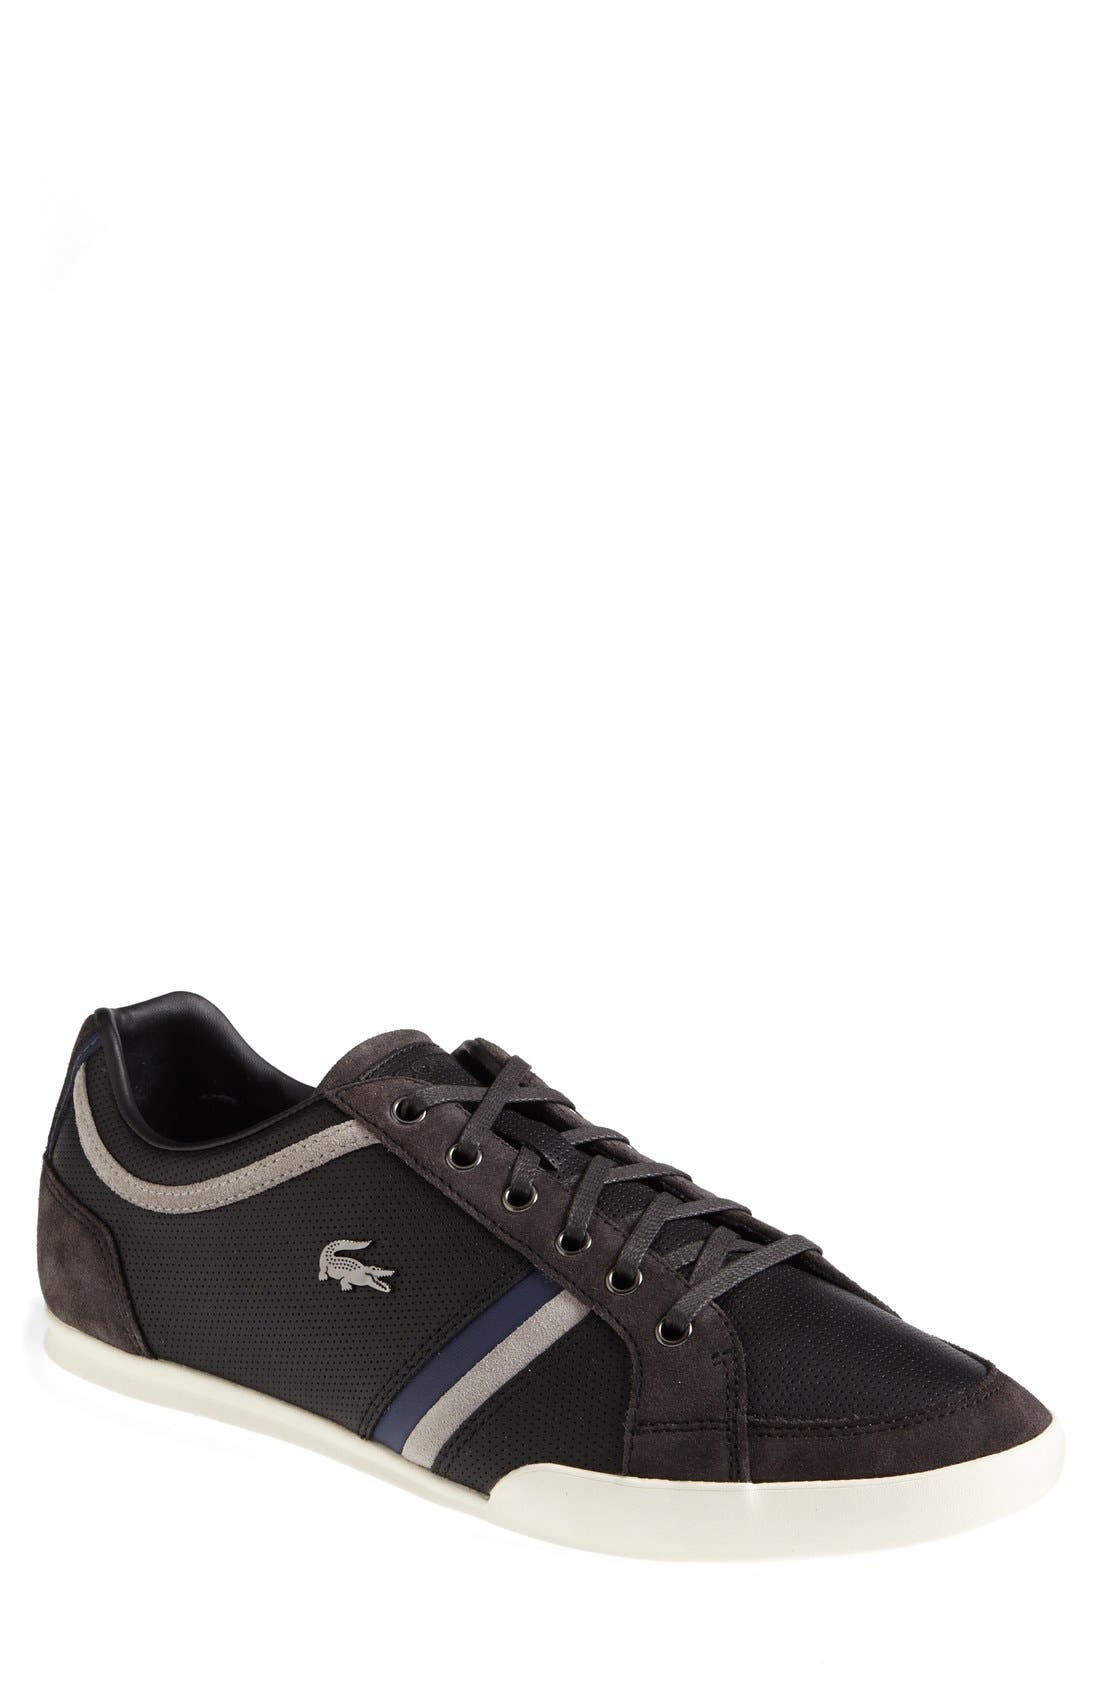 Main Image - Lacoste 'Rayford 6' Sneaker (Men)